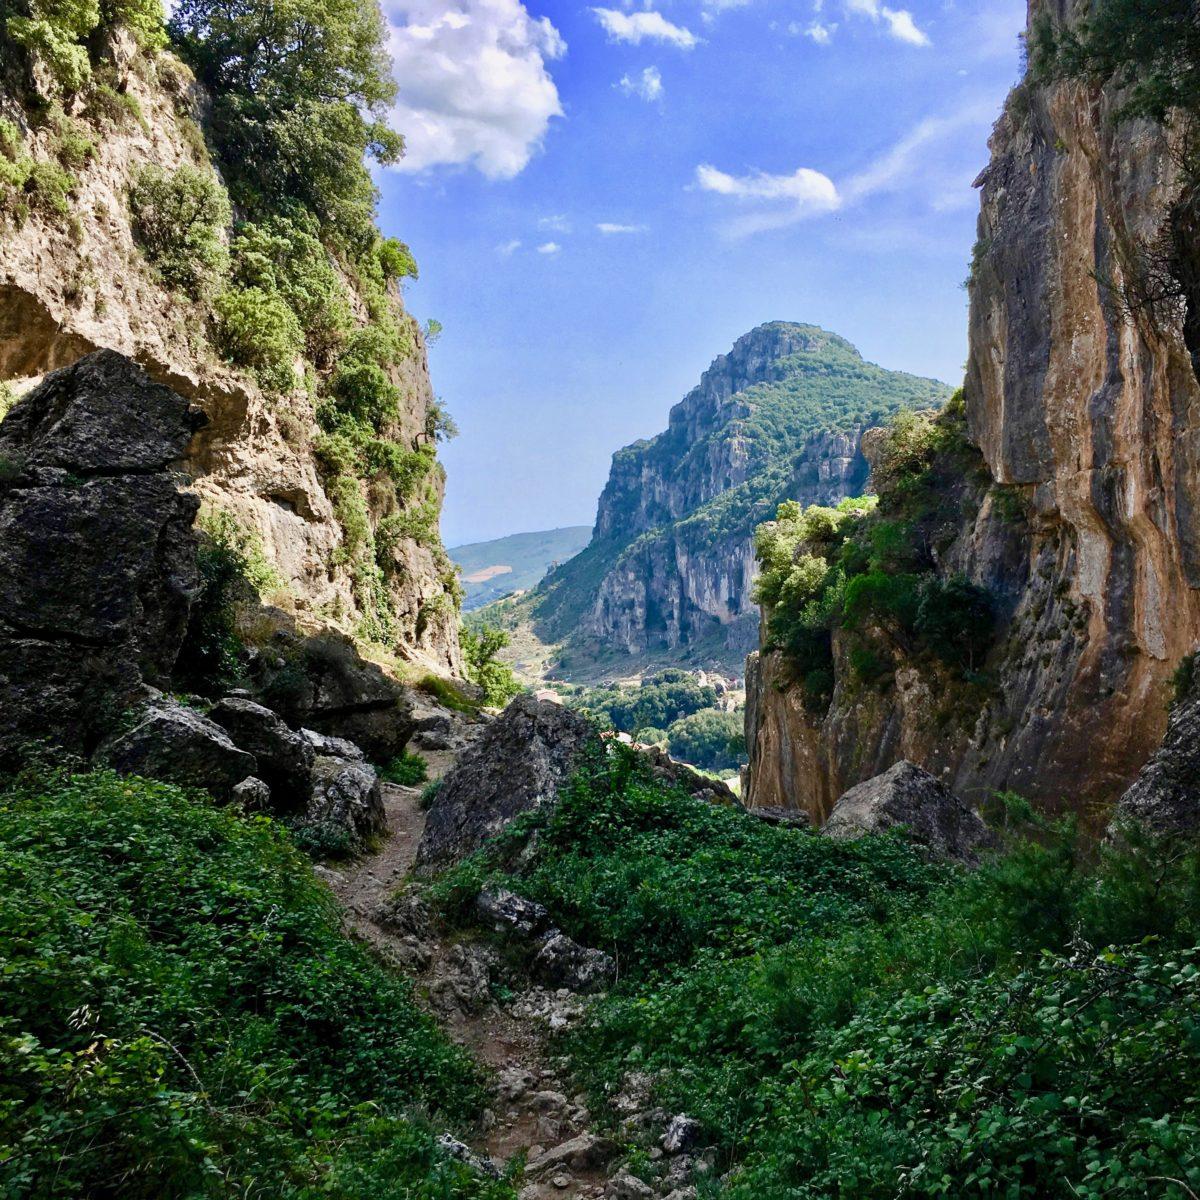 Klettern in Ulassai